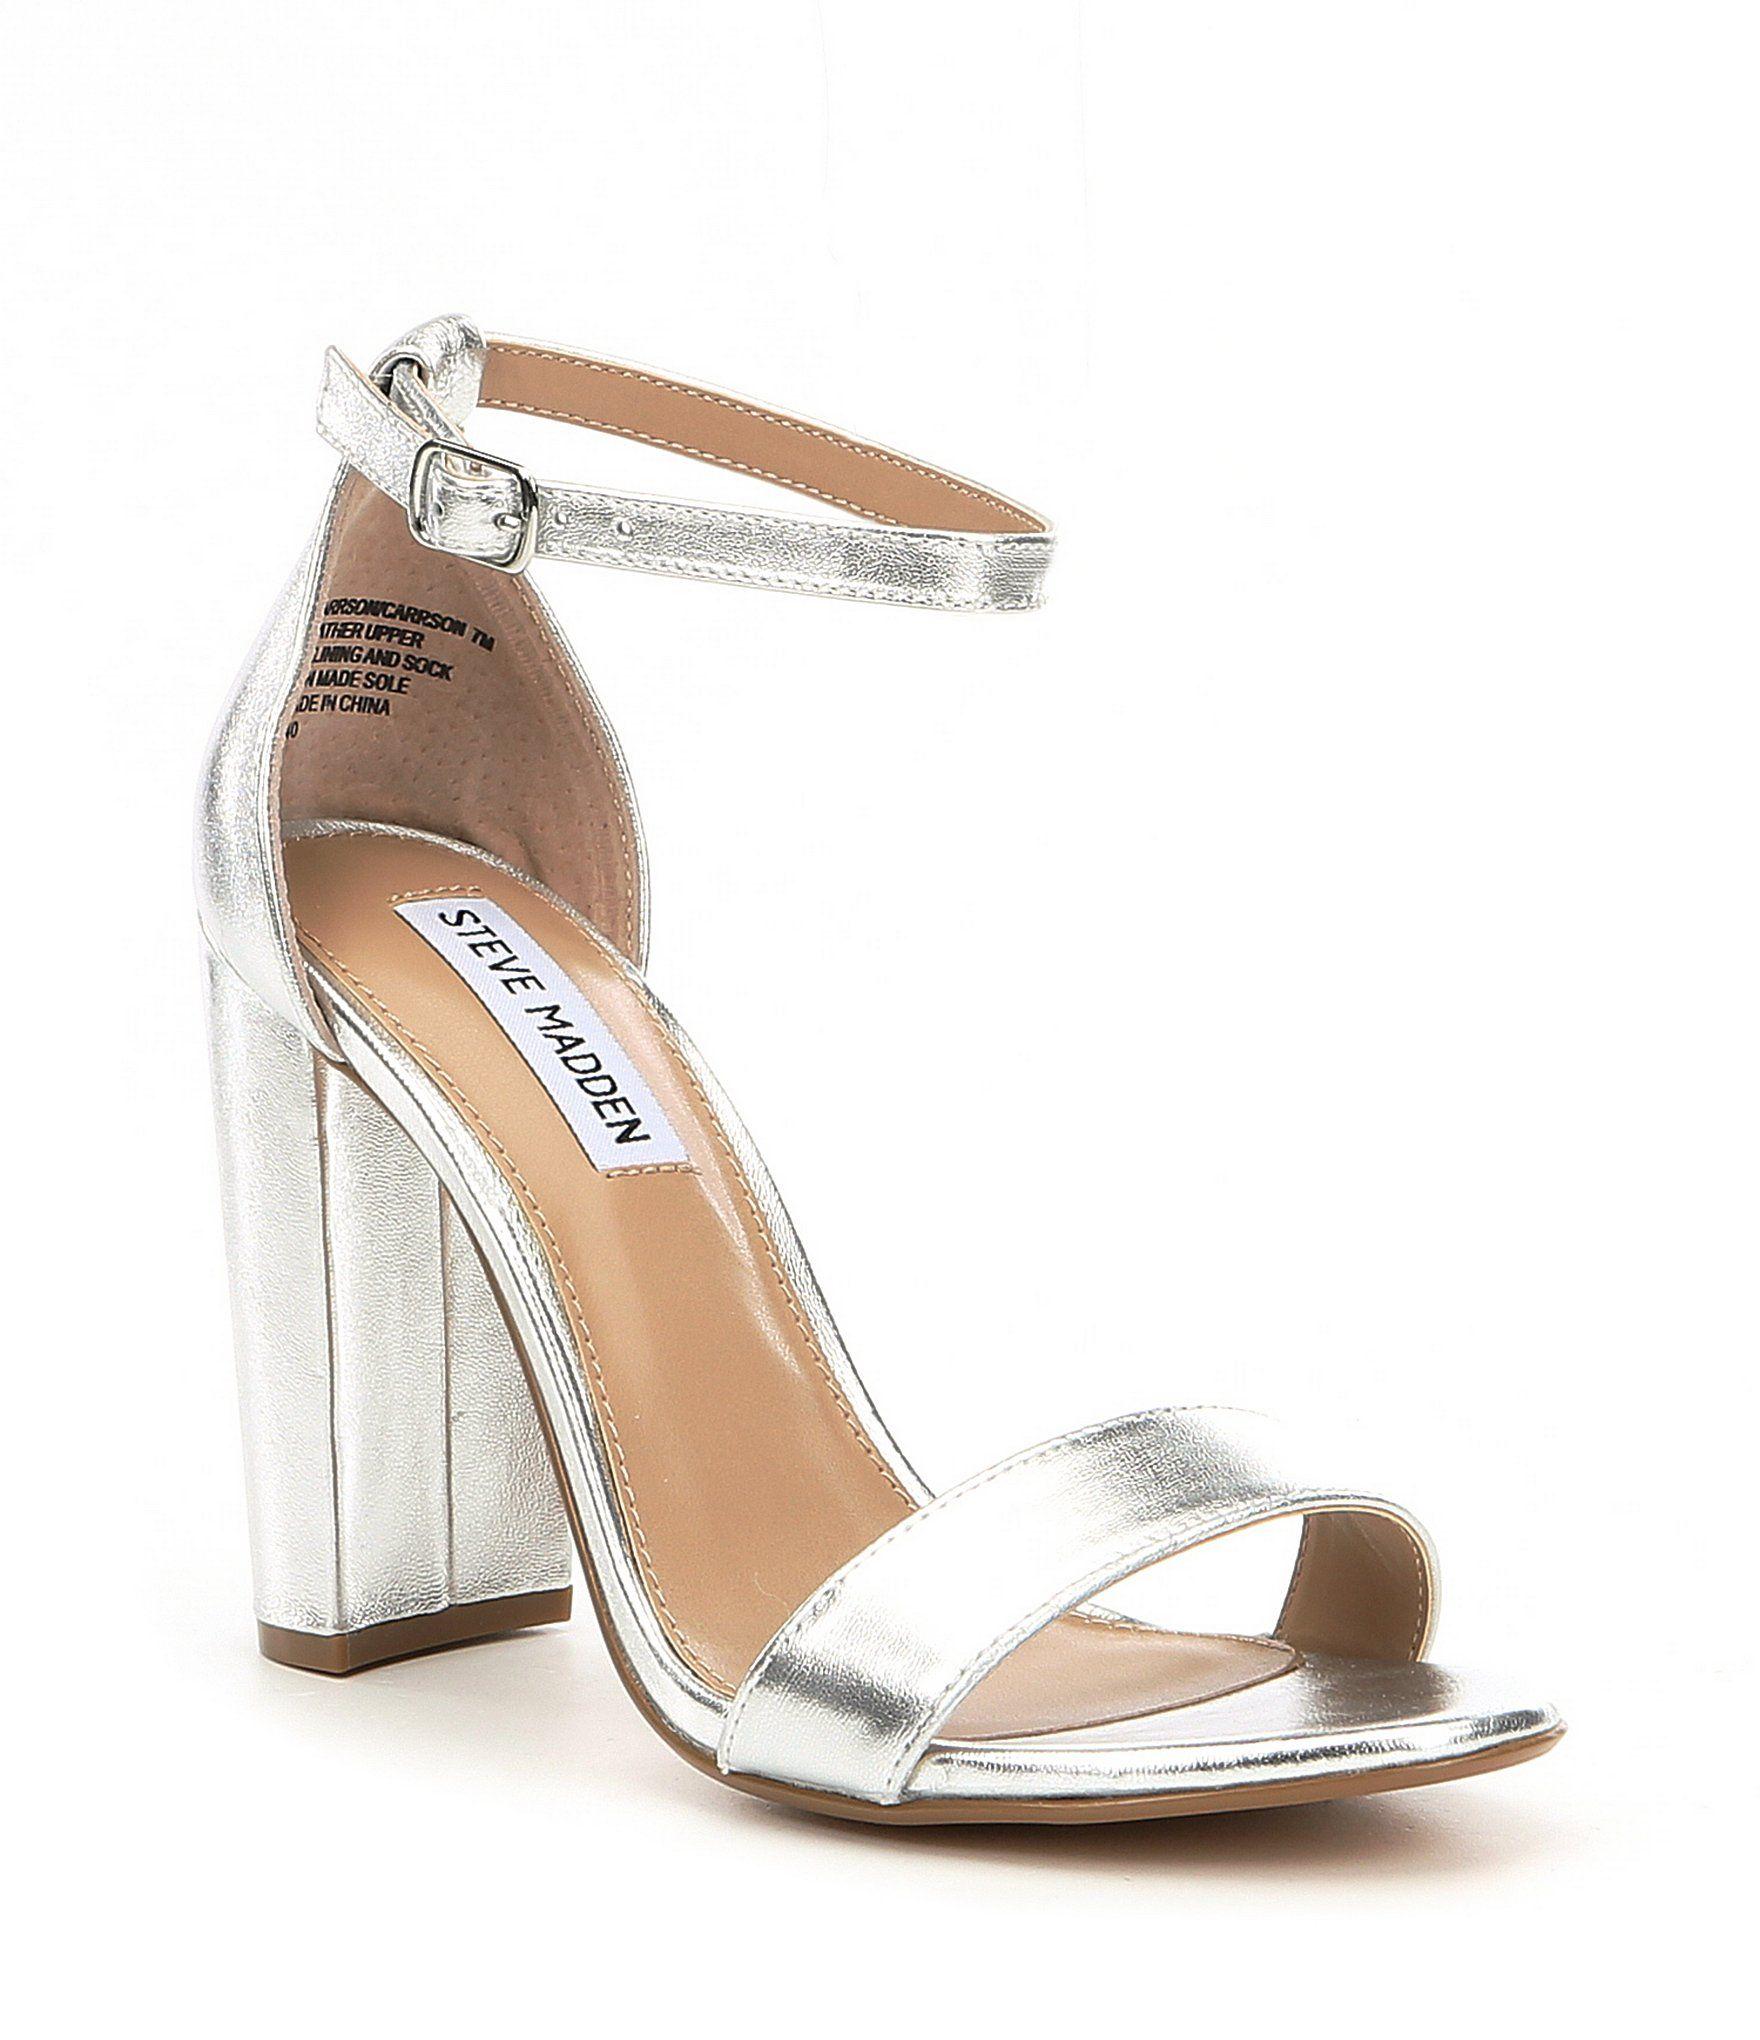 22f6a23dc9f0 Steve Madden Carrson Leather Ankle Strap Block Heel Dress Sandals  Dillards